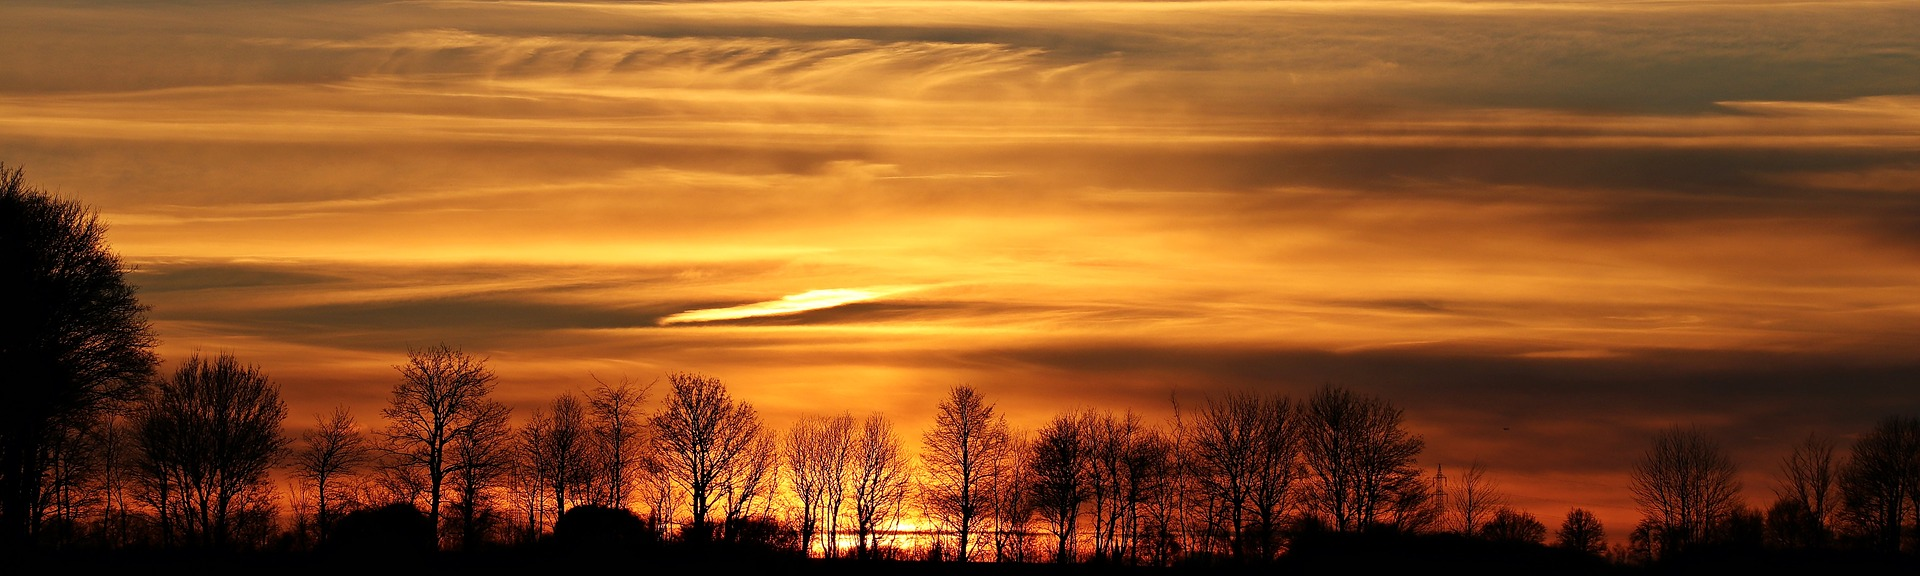 sunset-2021266_1920